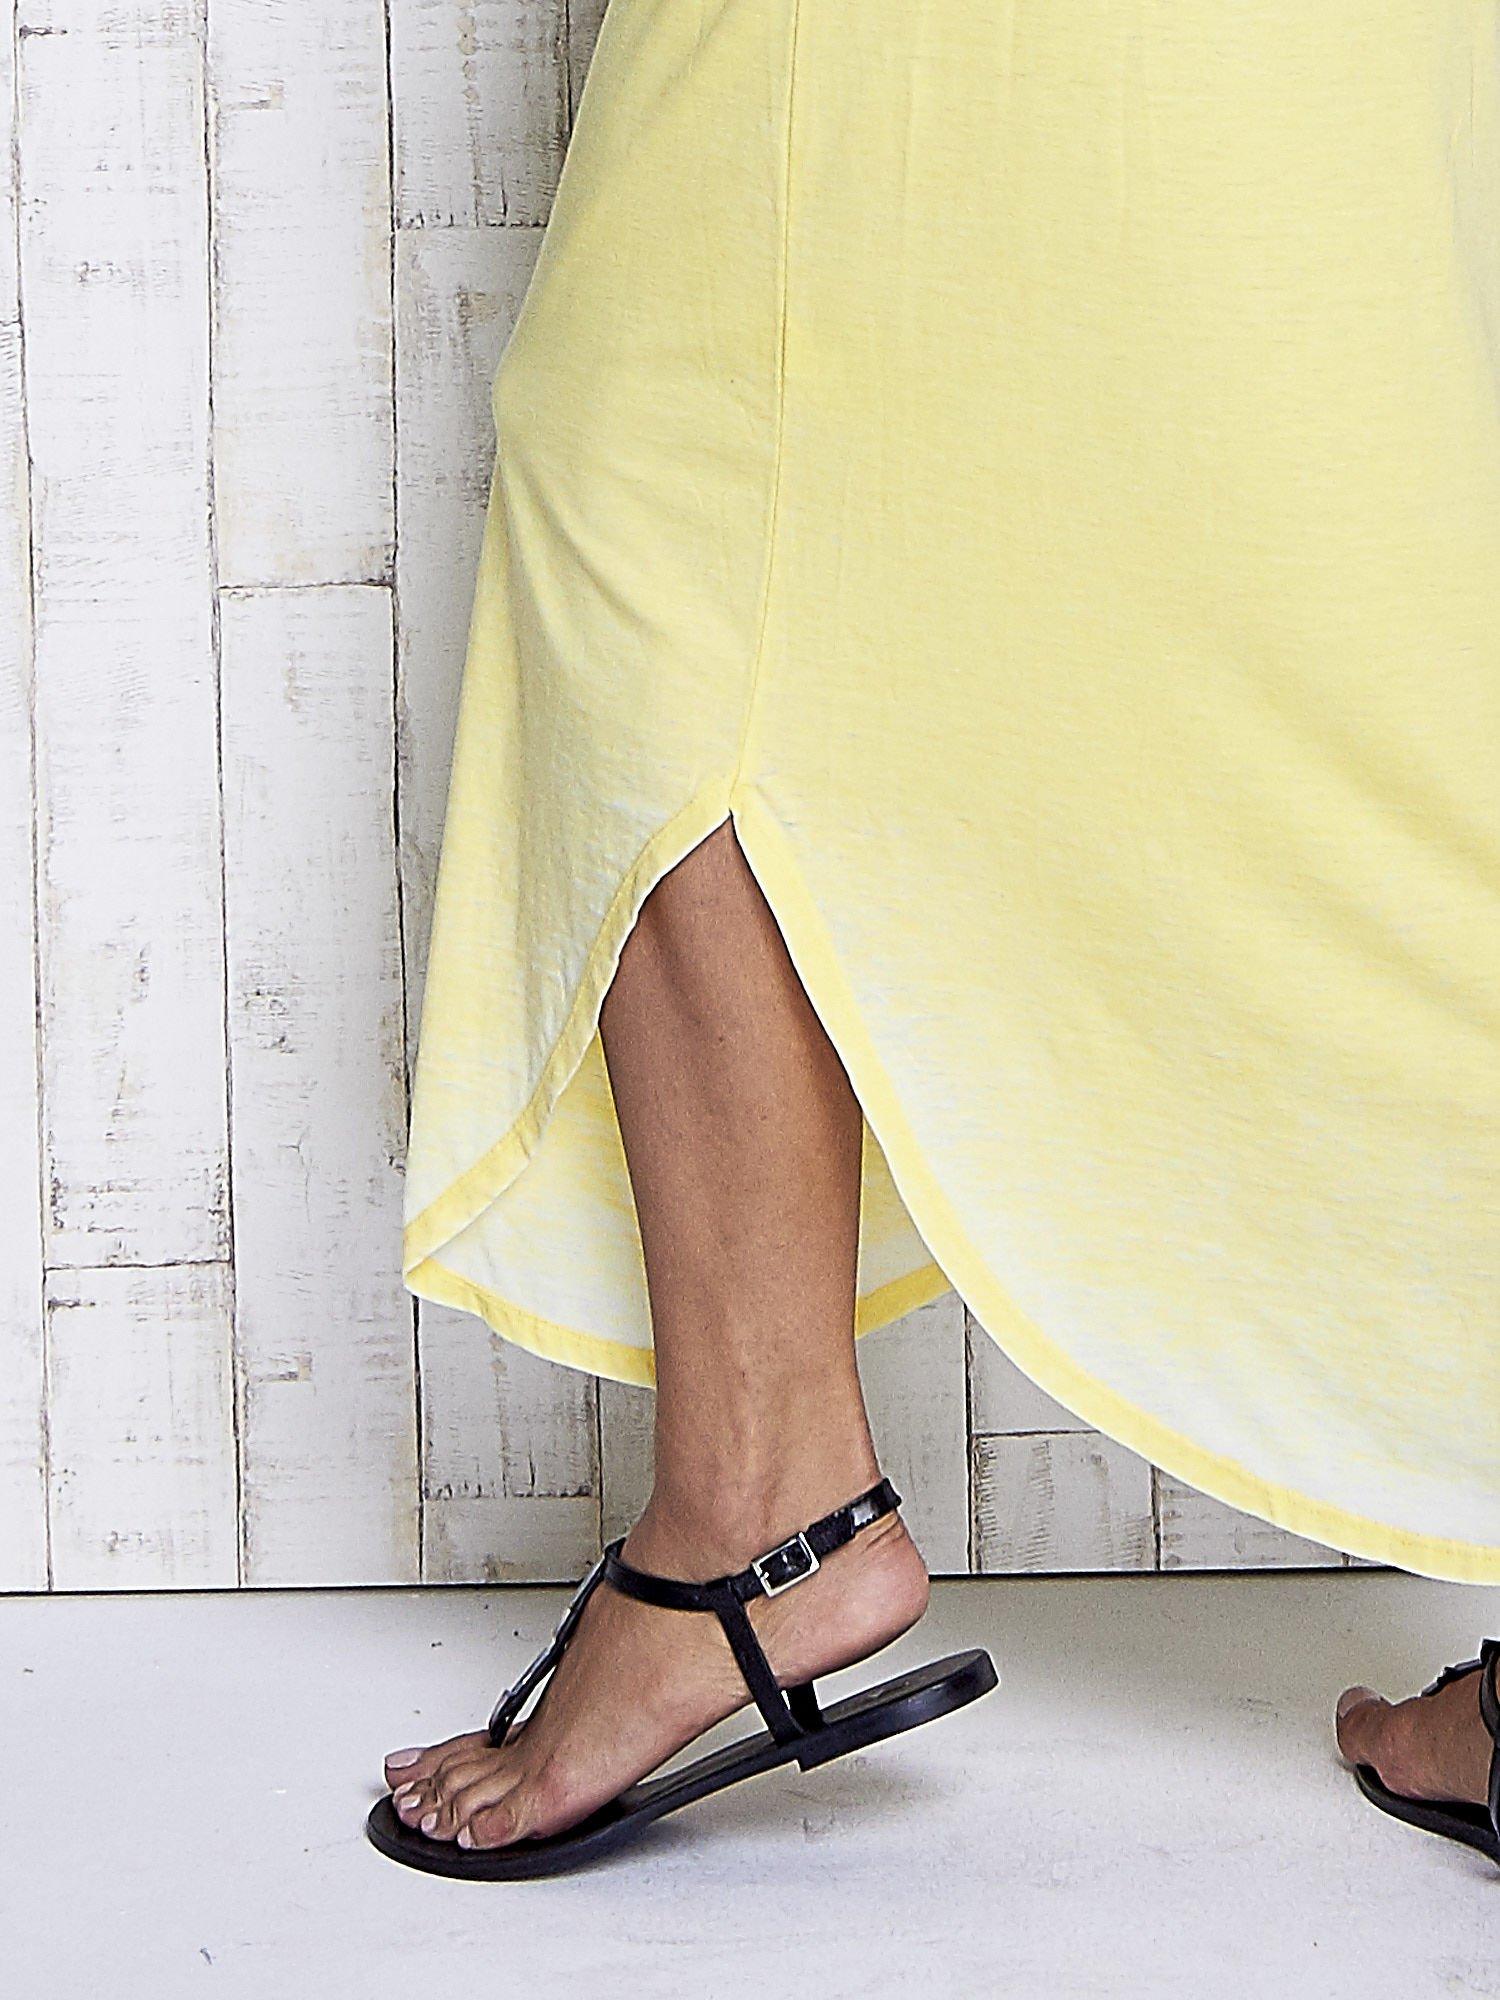 Żółta długa sukienka acid wash                                   zdj.                                  6